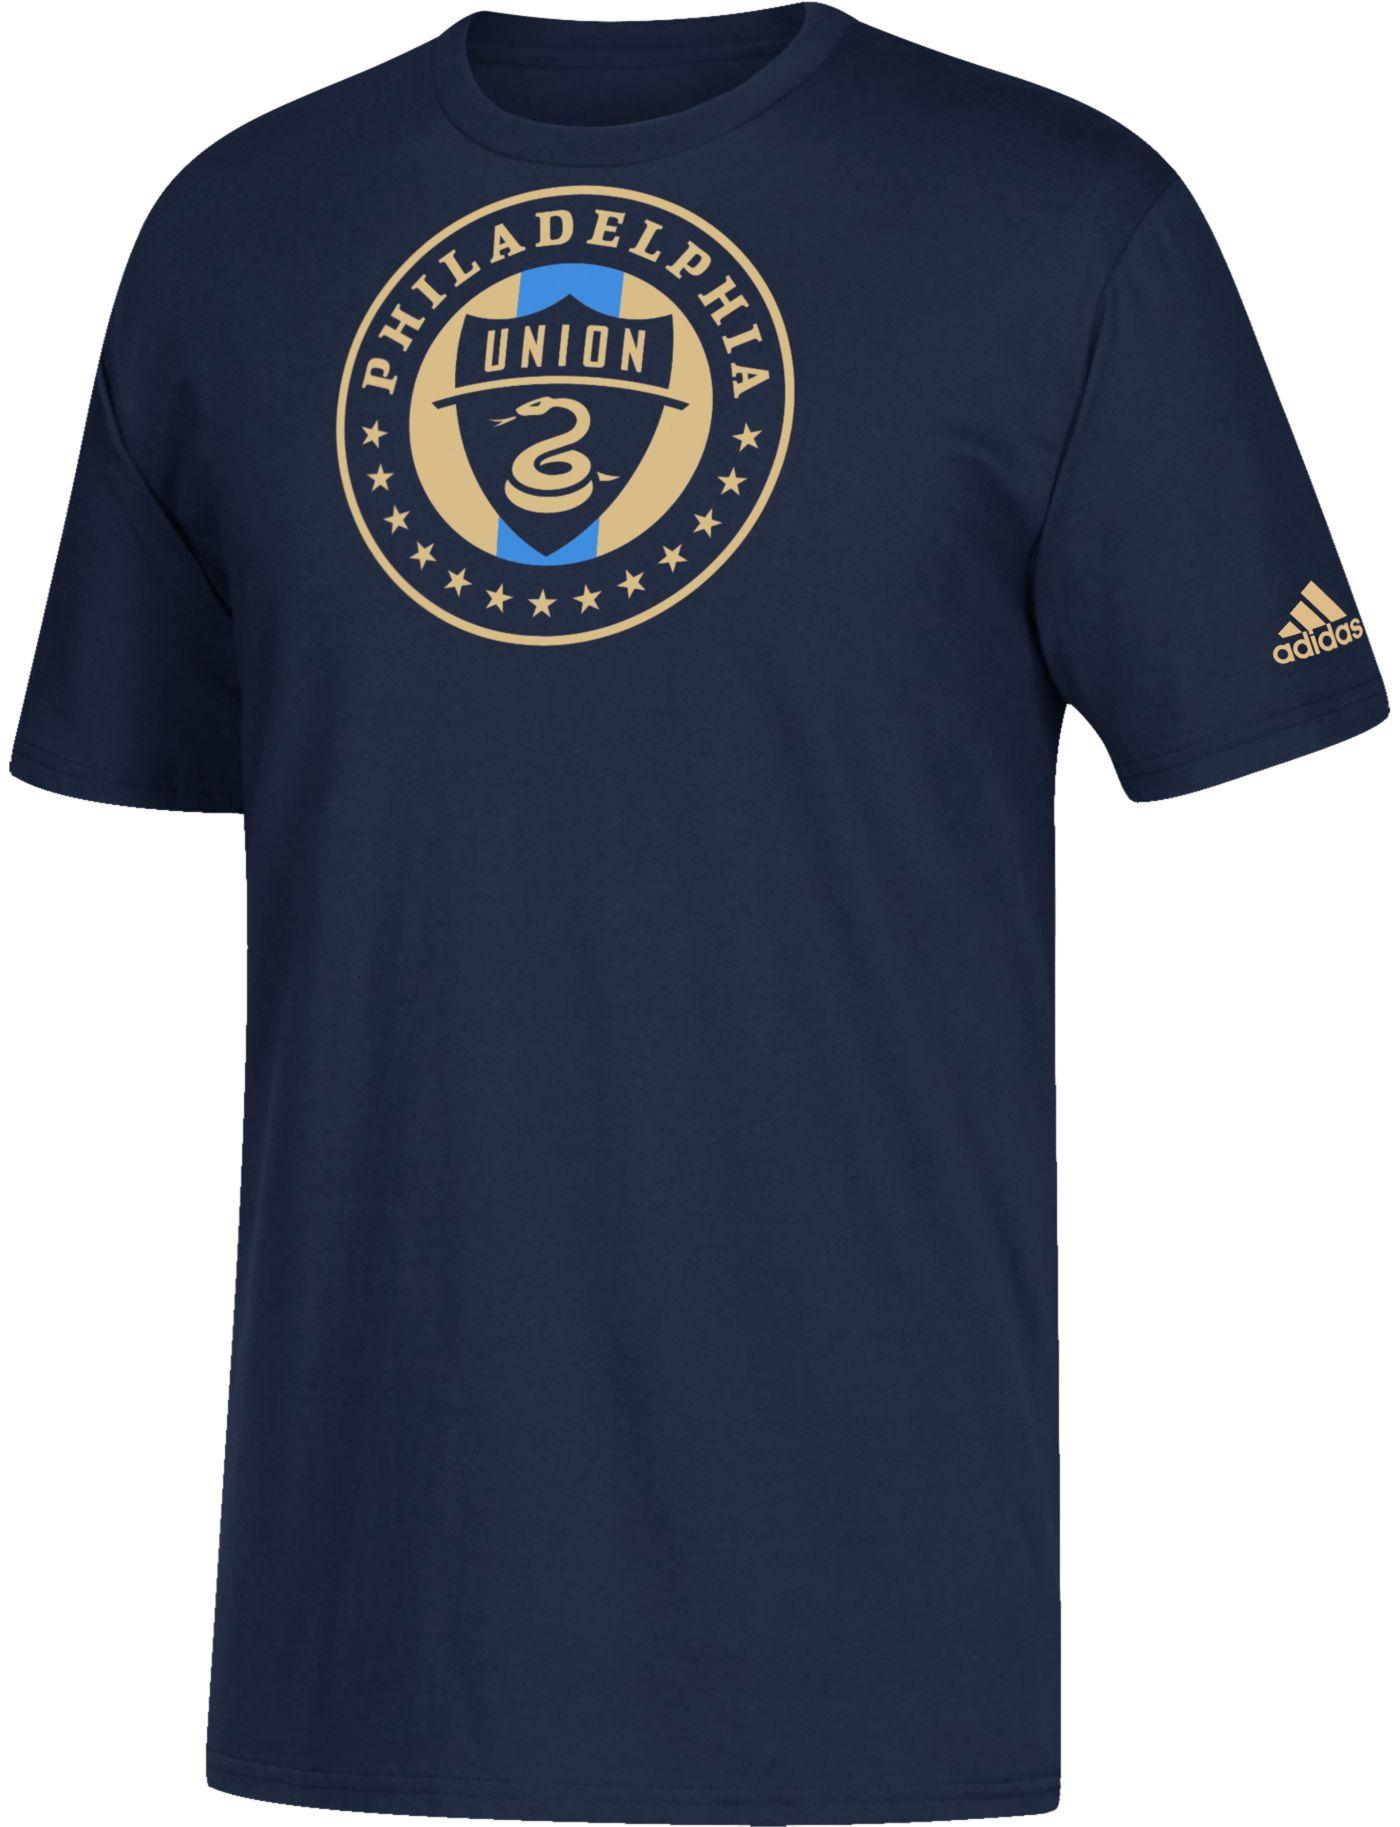 adidas Youth Philadelphia Union Squad Navy T-Shirt